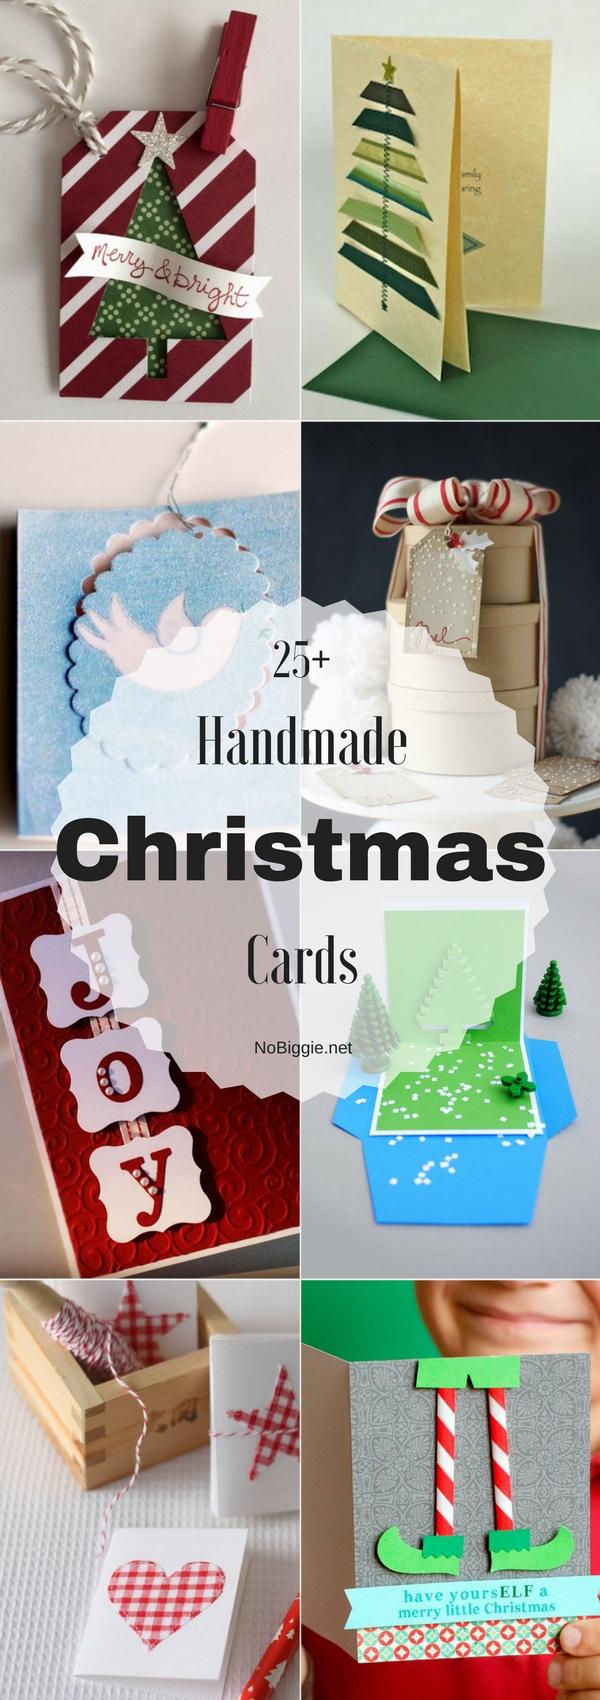 25+ Handmade Christmas Cards  | NoBiggie.net